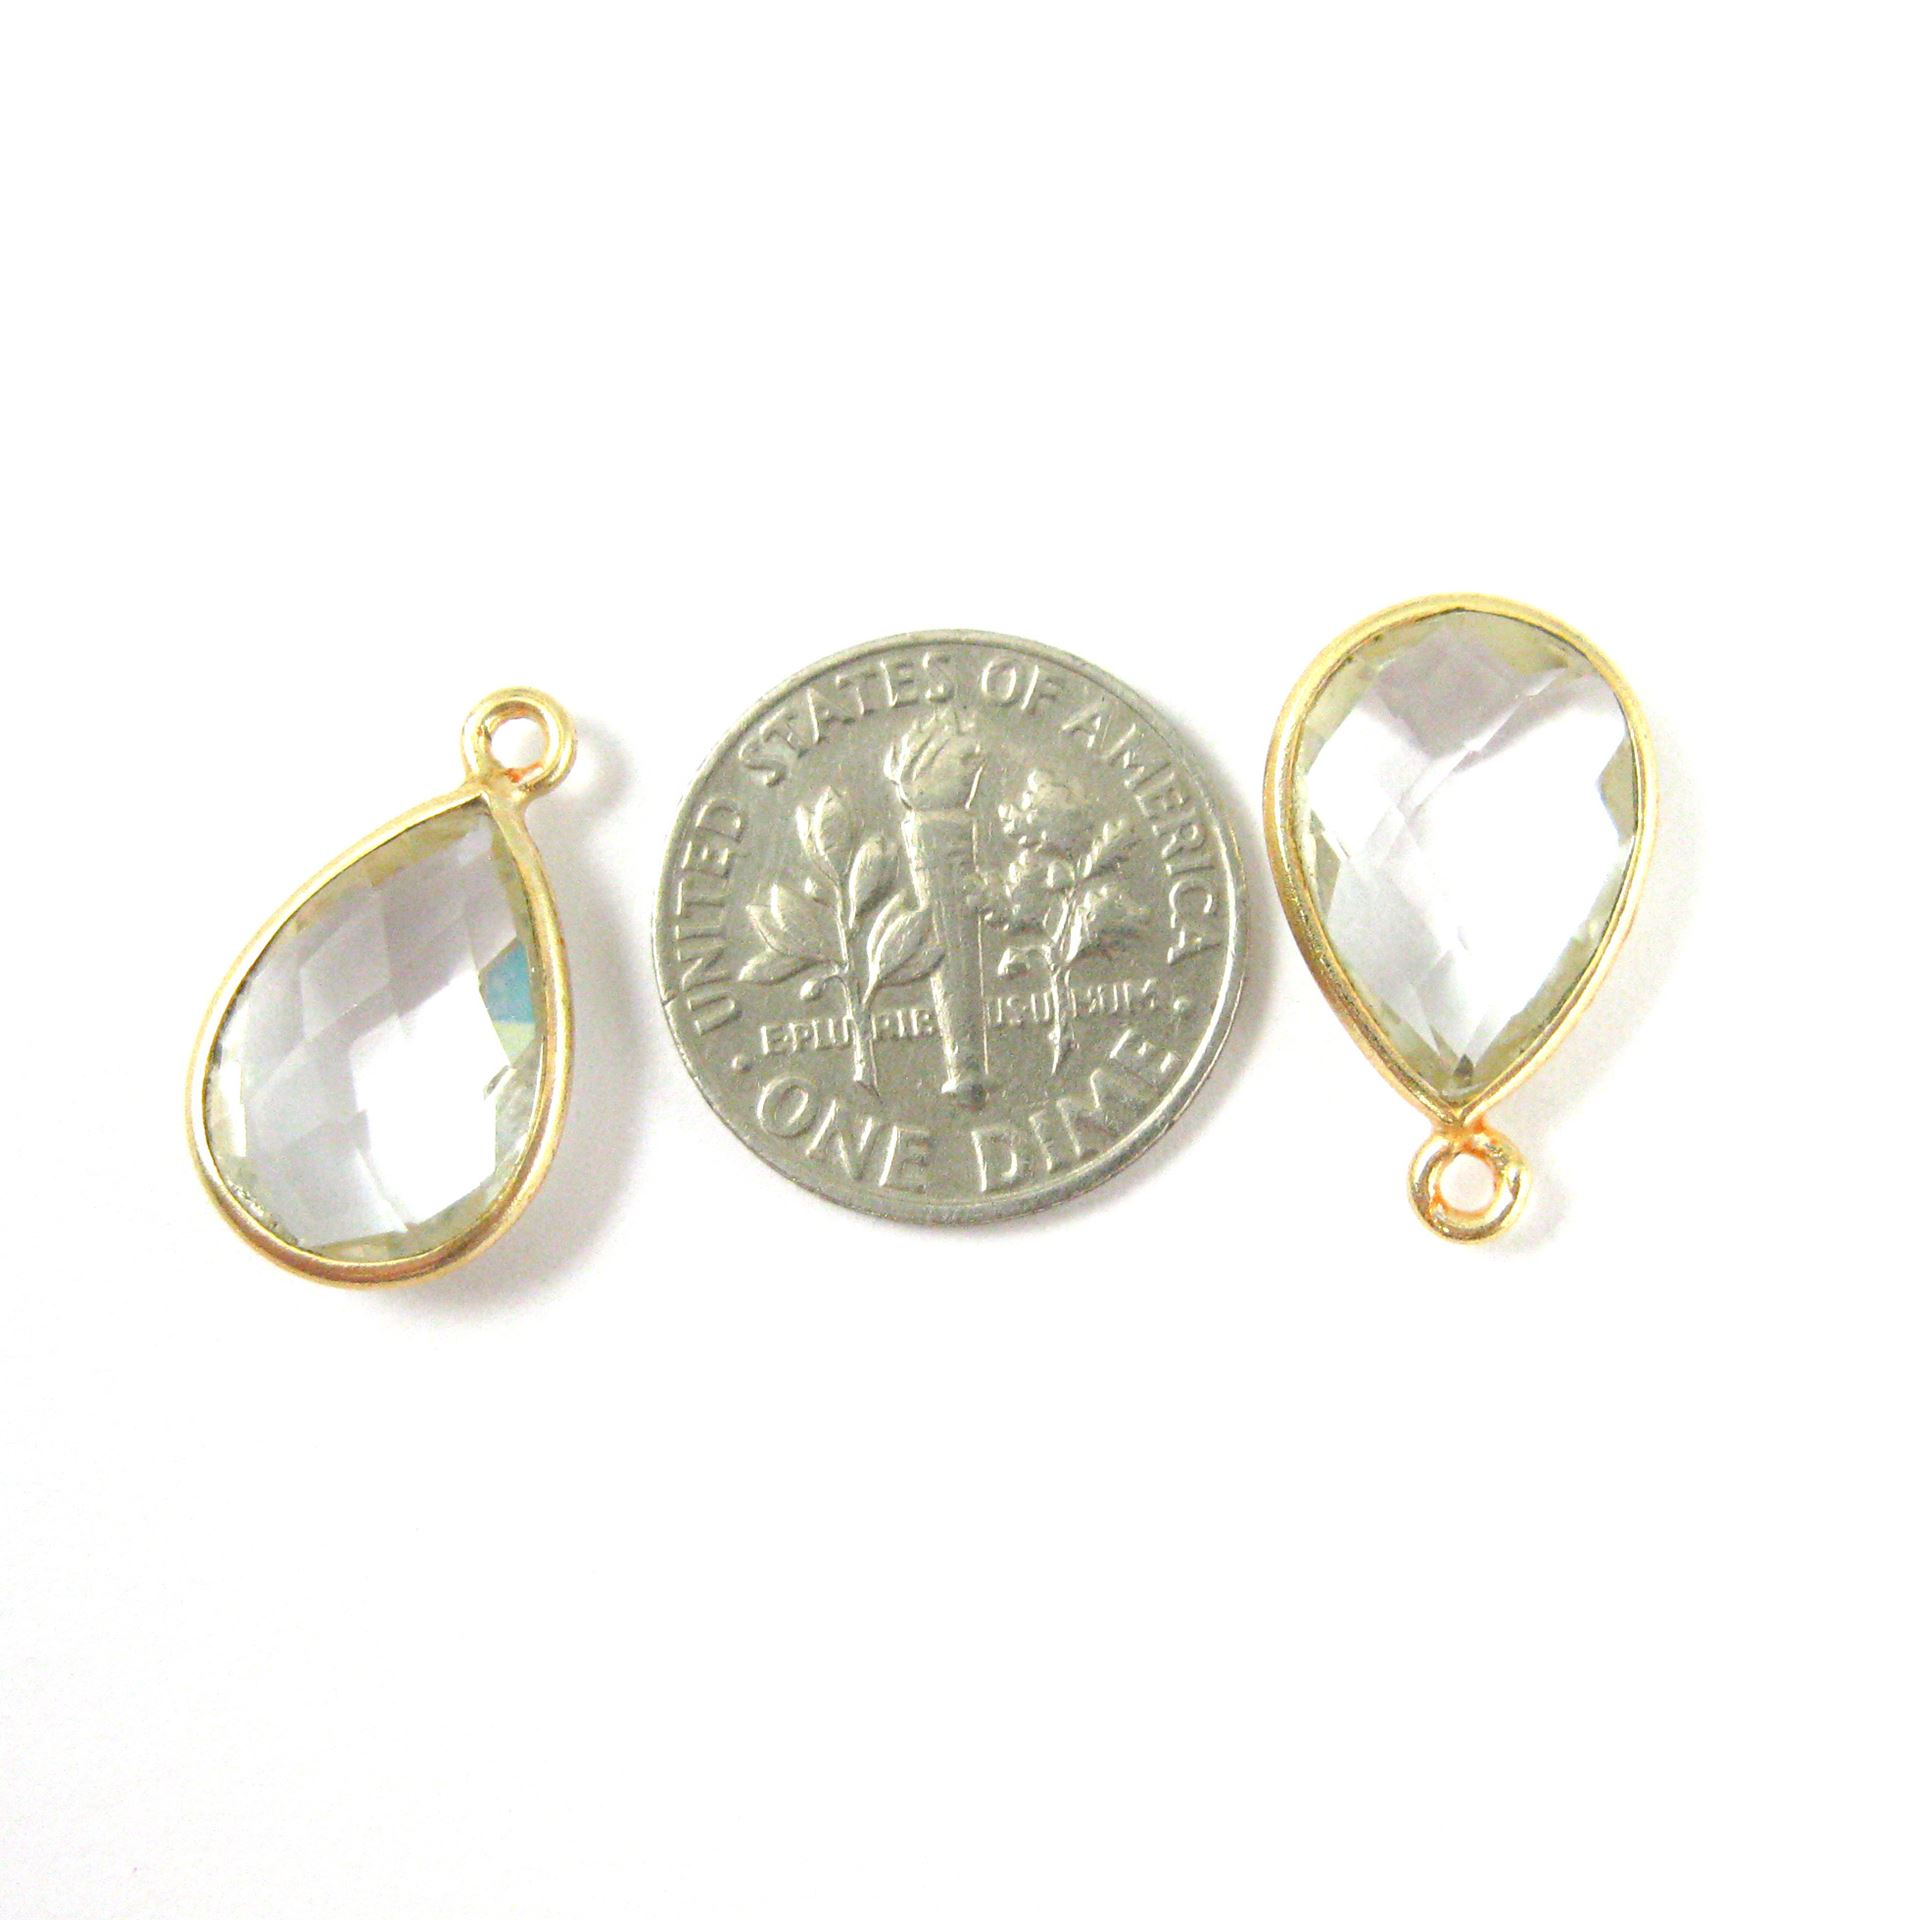 Bezel Gemstone Pendant - 10x14mm Faceted Small Teardop Shape - Crystal Quartz (Sold per 2 pieces)